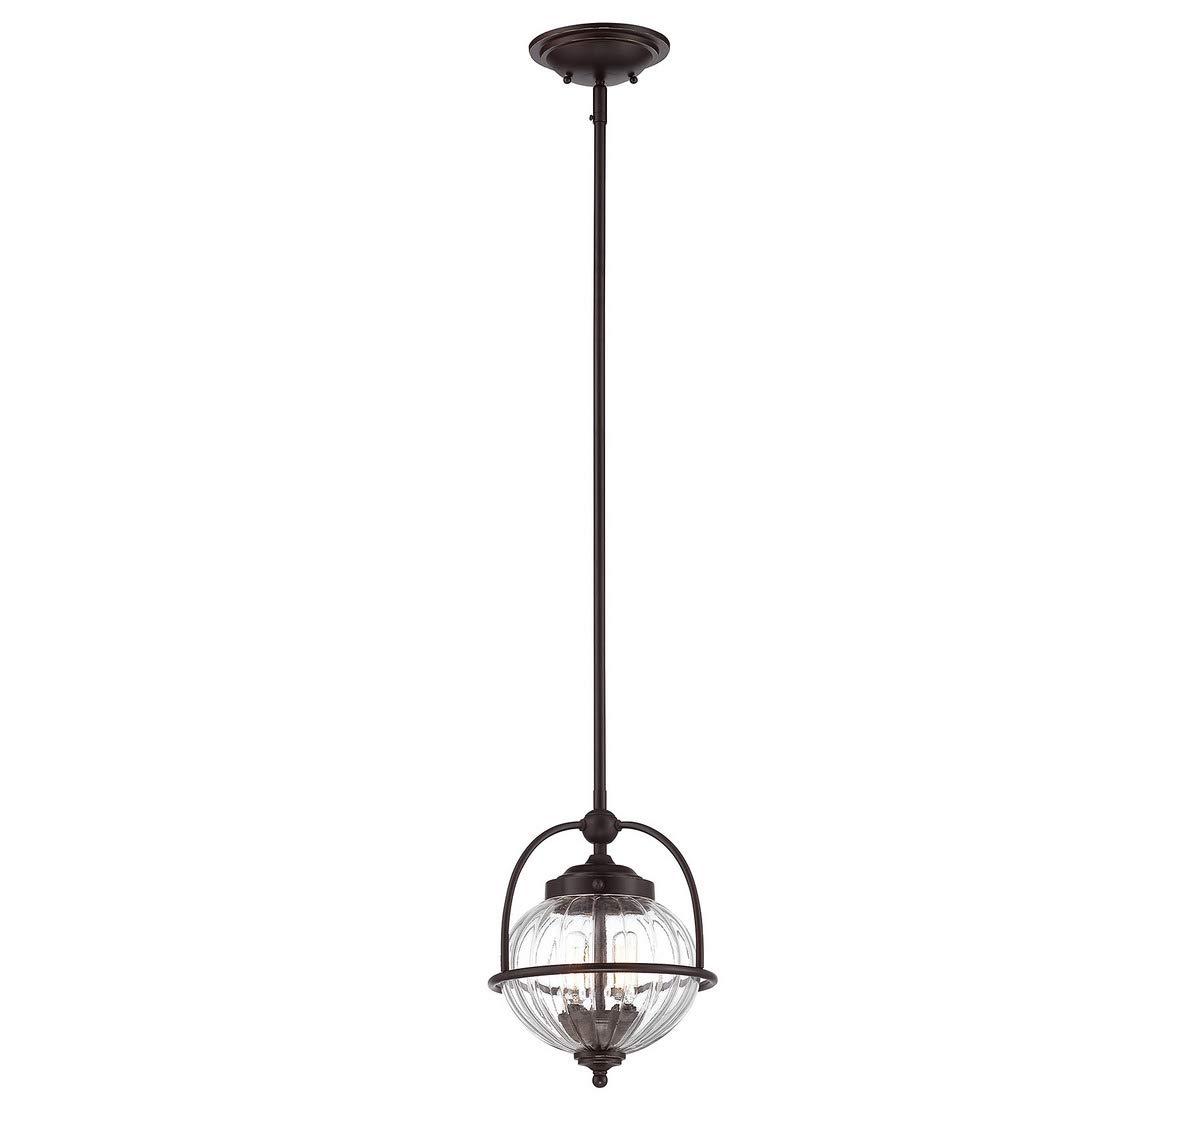 Savoy House 7-460-2-213 Two Light Pendant